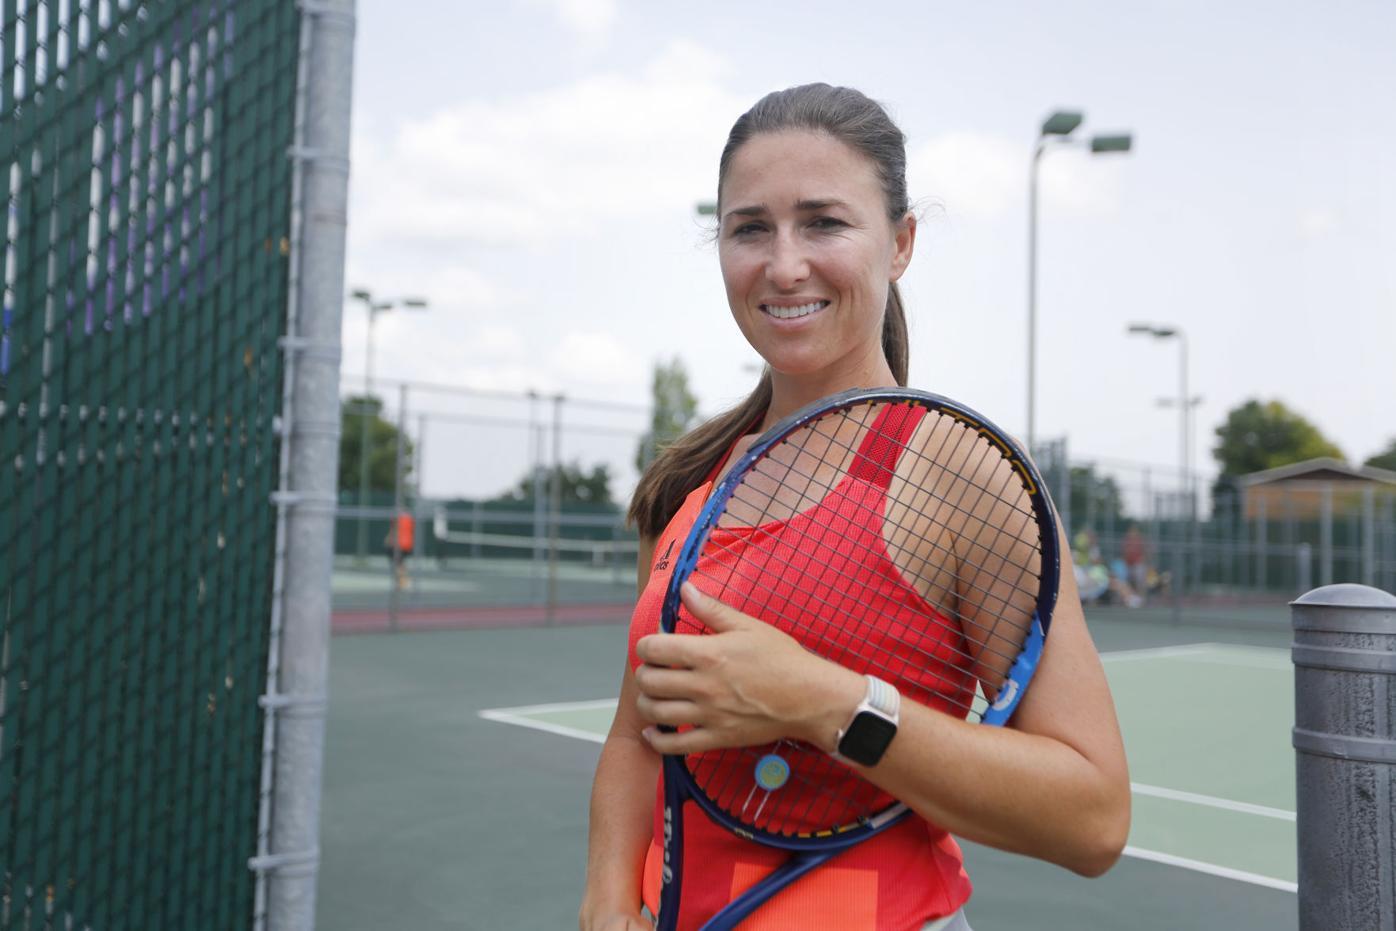 Tennis - Milica Veselinovic